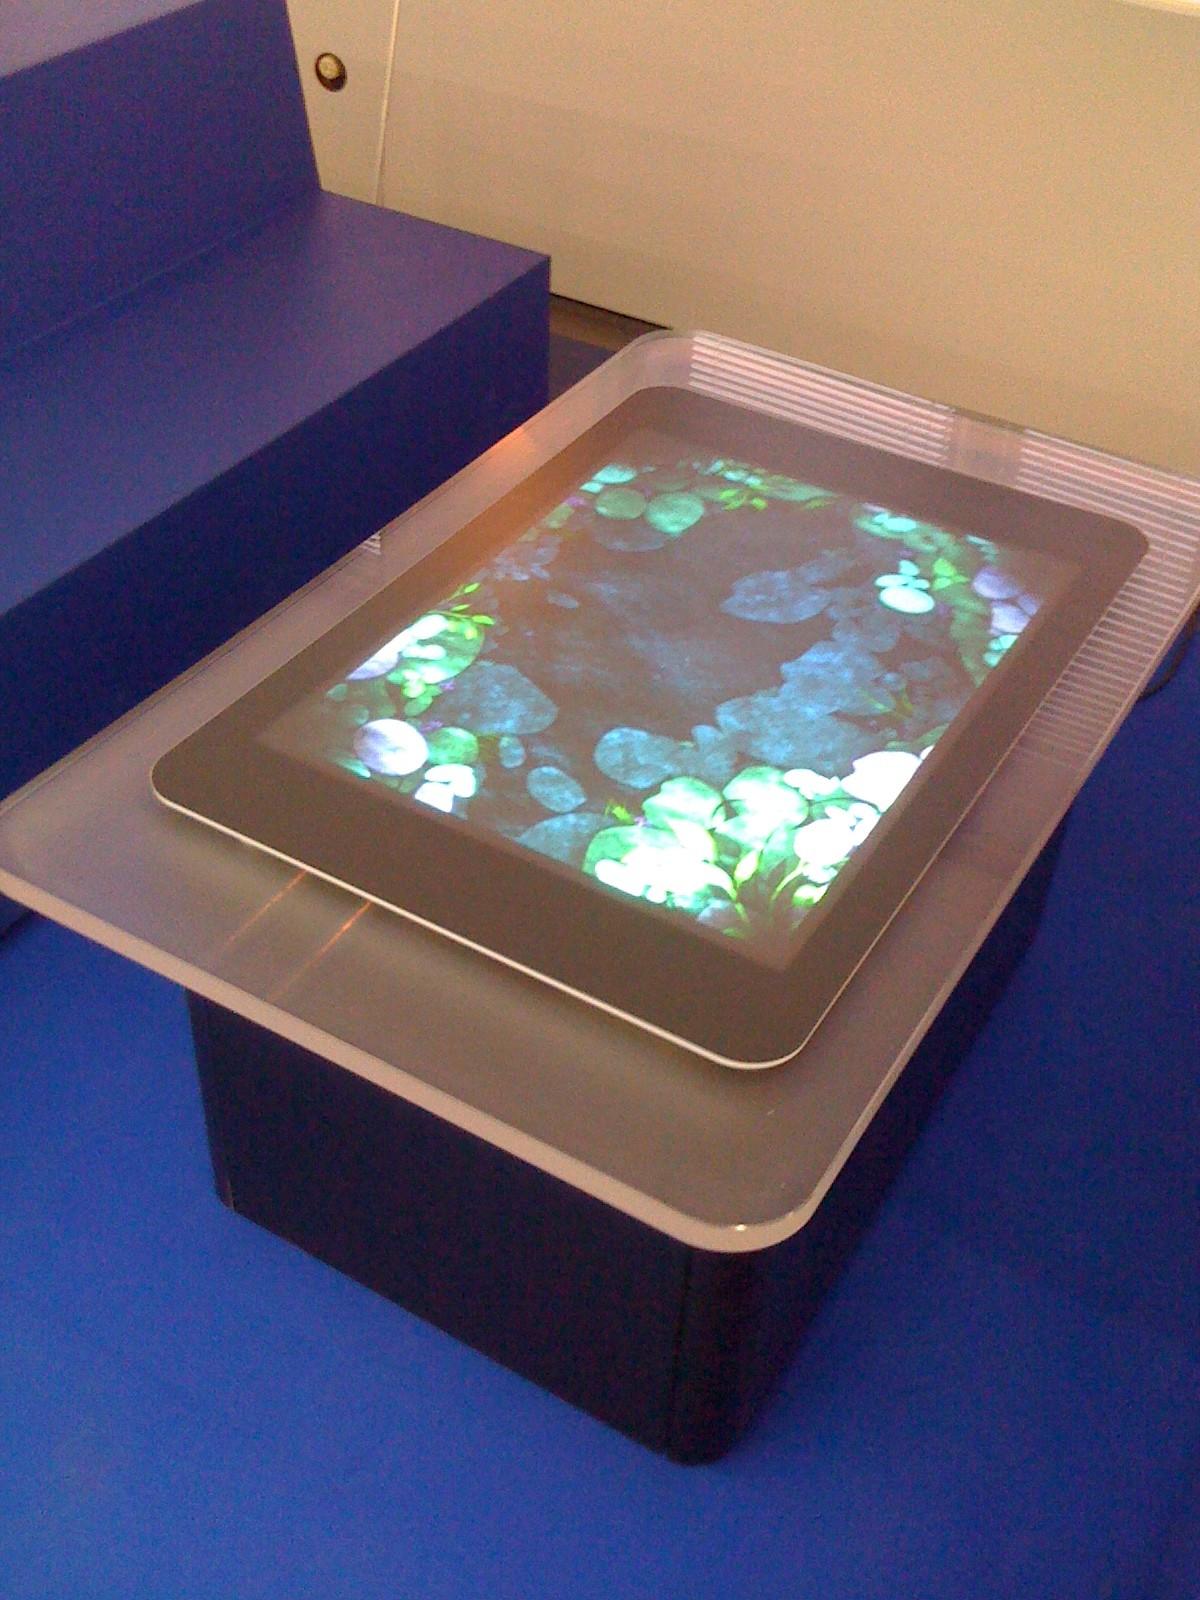 Een Microsoft Surface computer